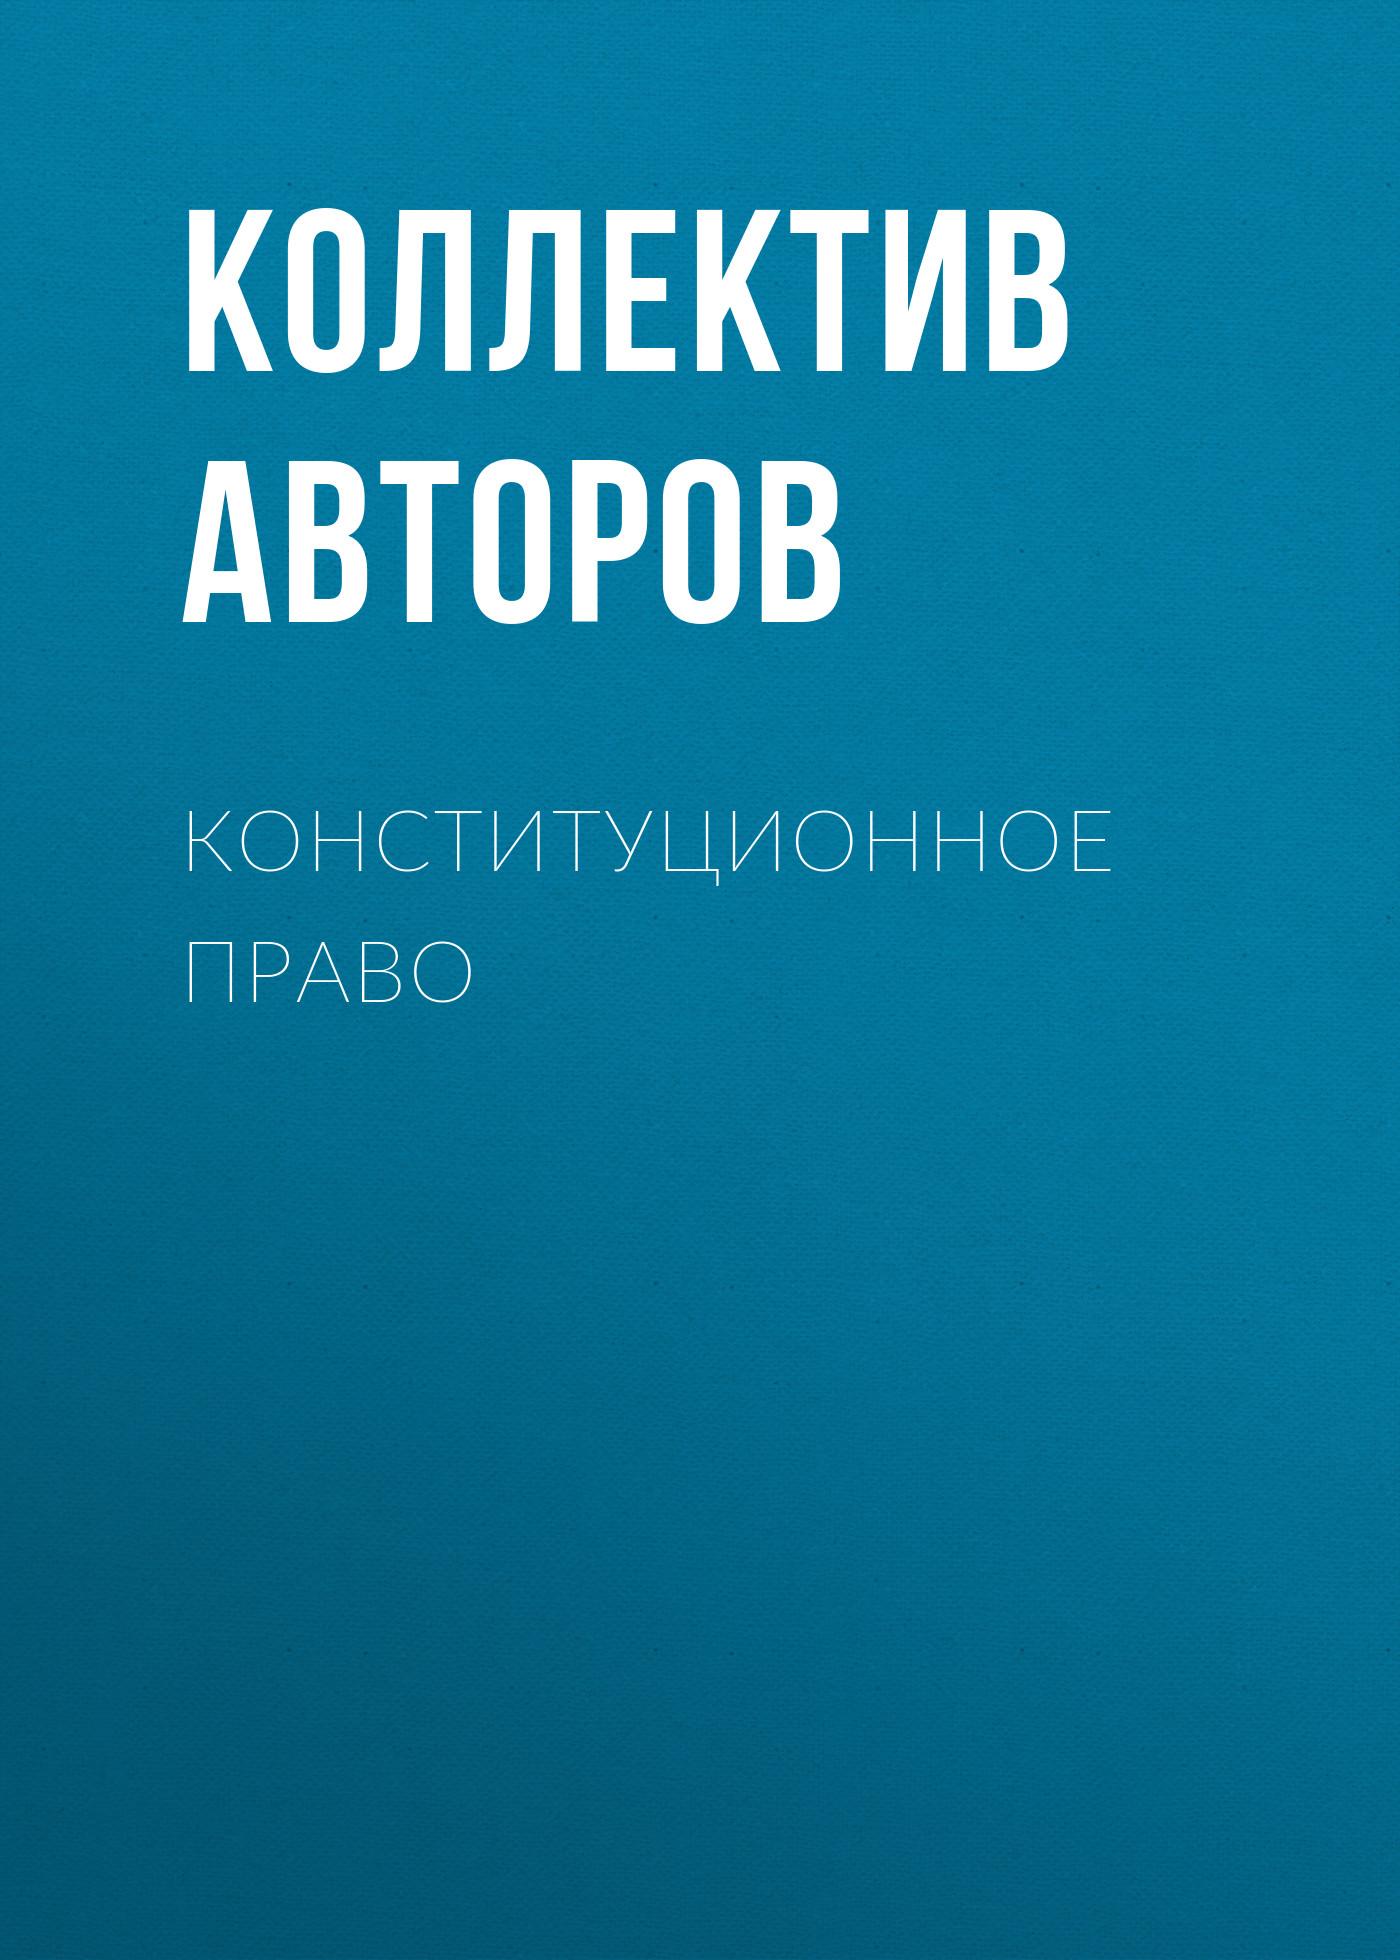 Коллектив авторов Конституционное право коллектив авторов ювенальное право